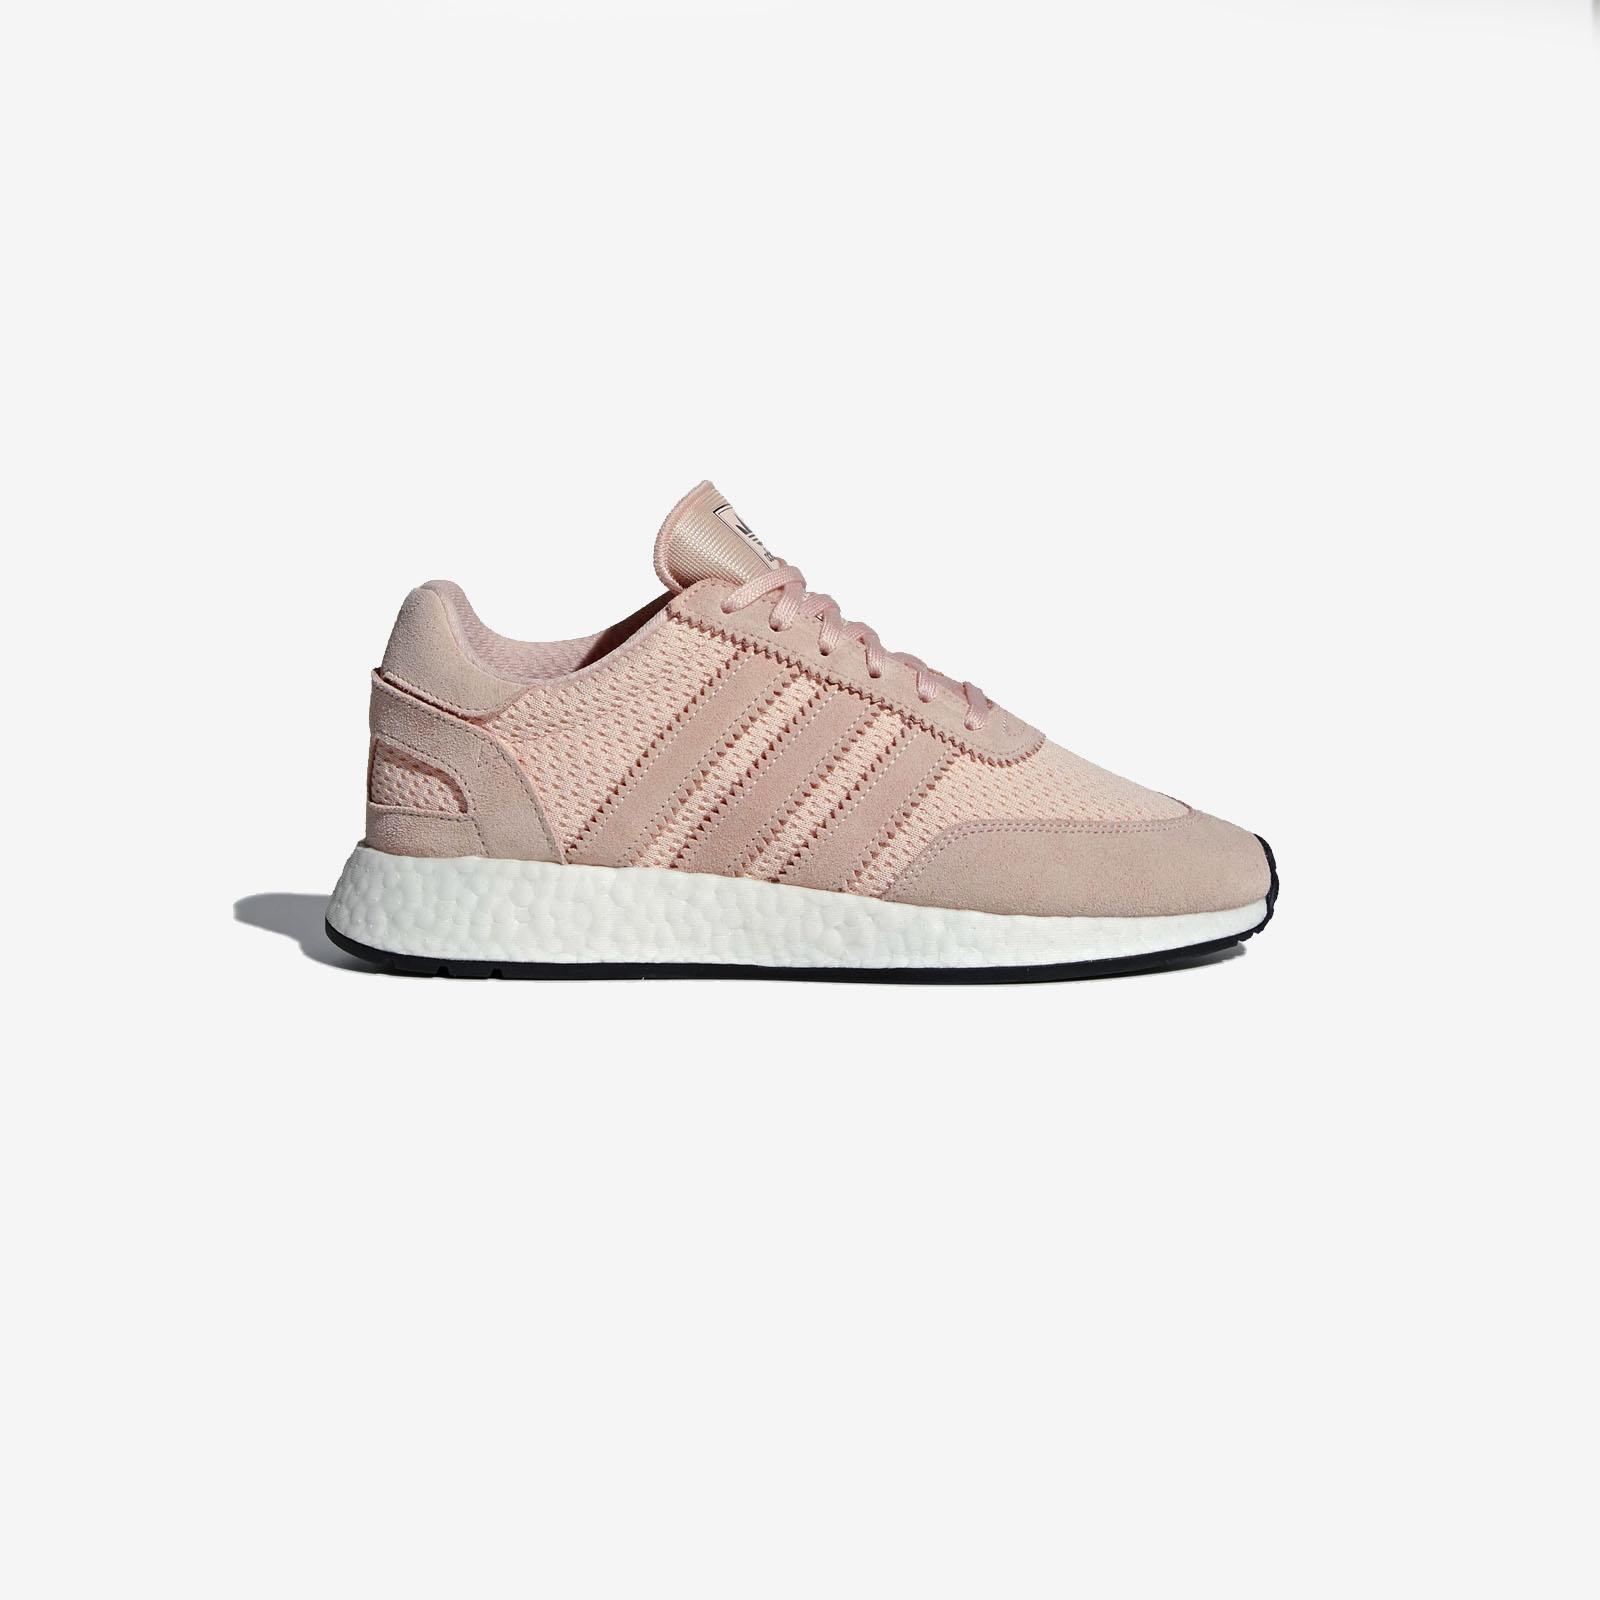 4d44616724b8b adidas I-5923 - D96609 - Sneakersnstuff